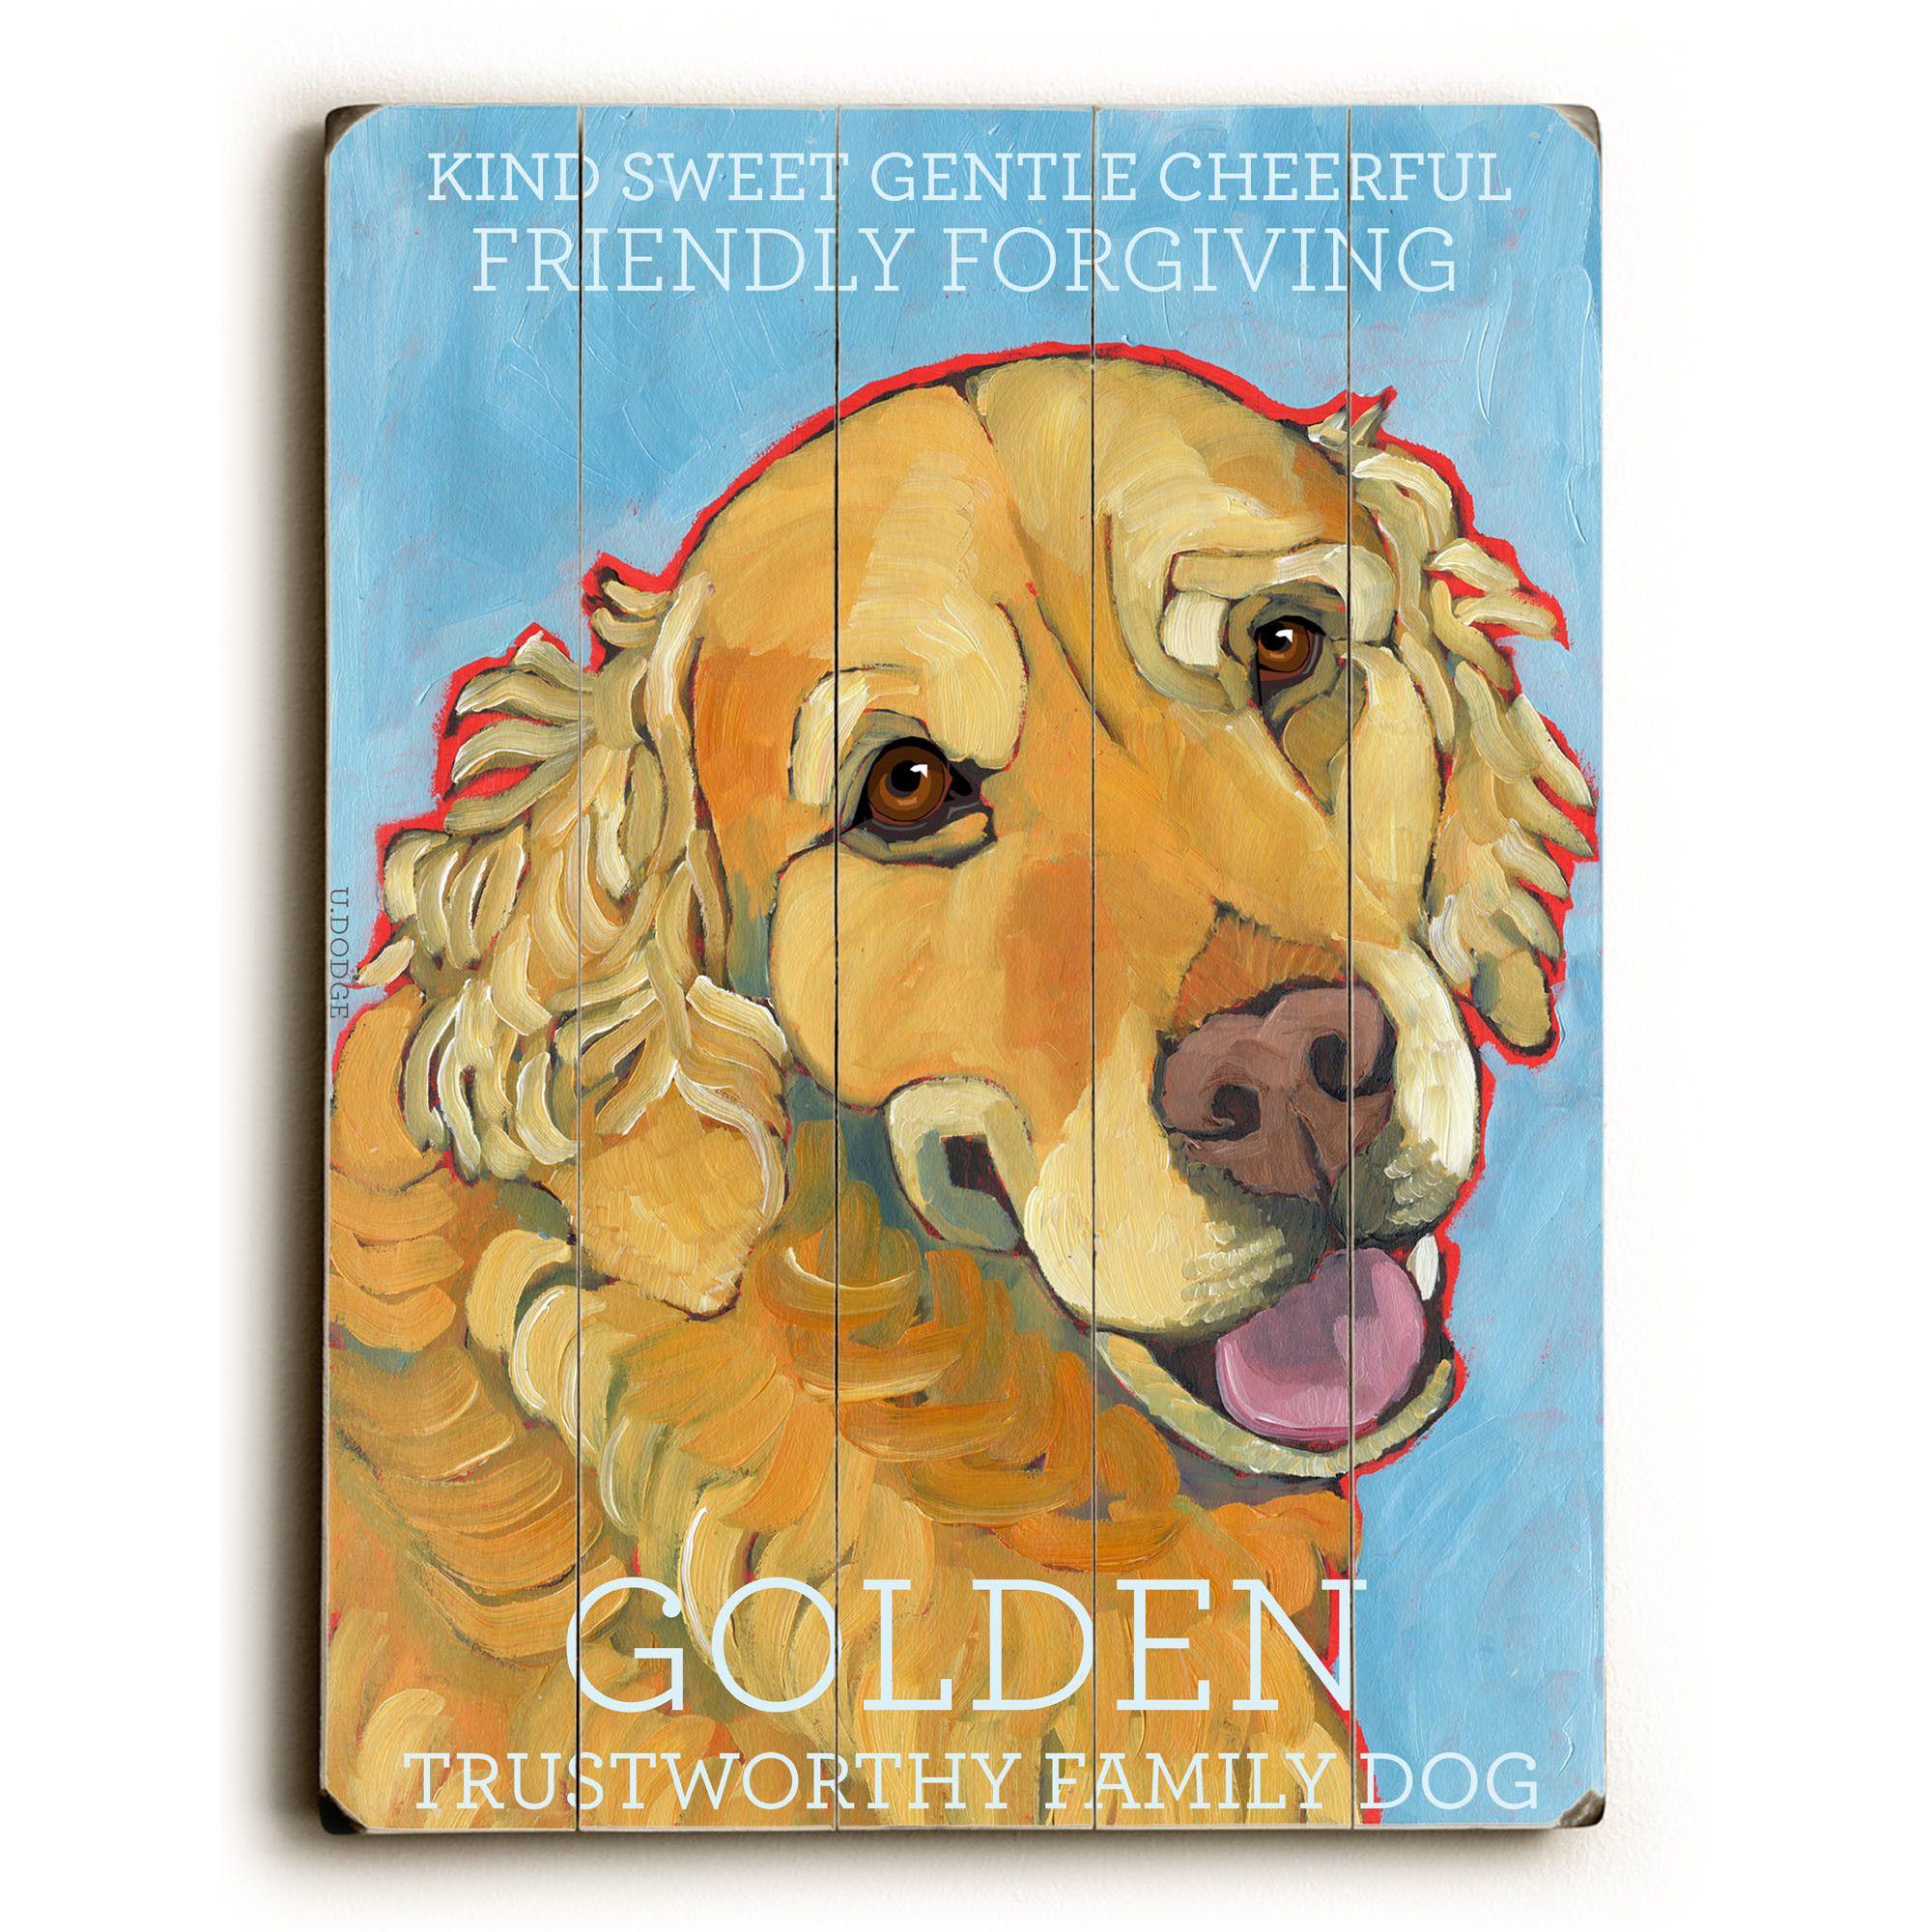 Golden by Ursula Dodge Graphic Art Plaque | Products | Pinterest ...